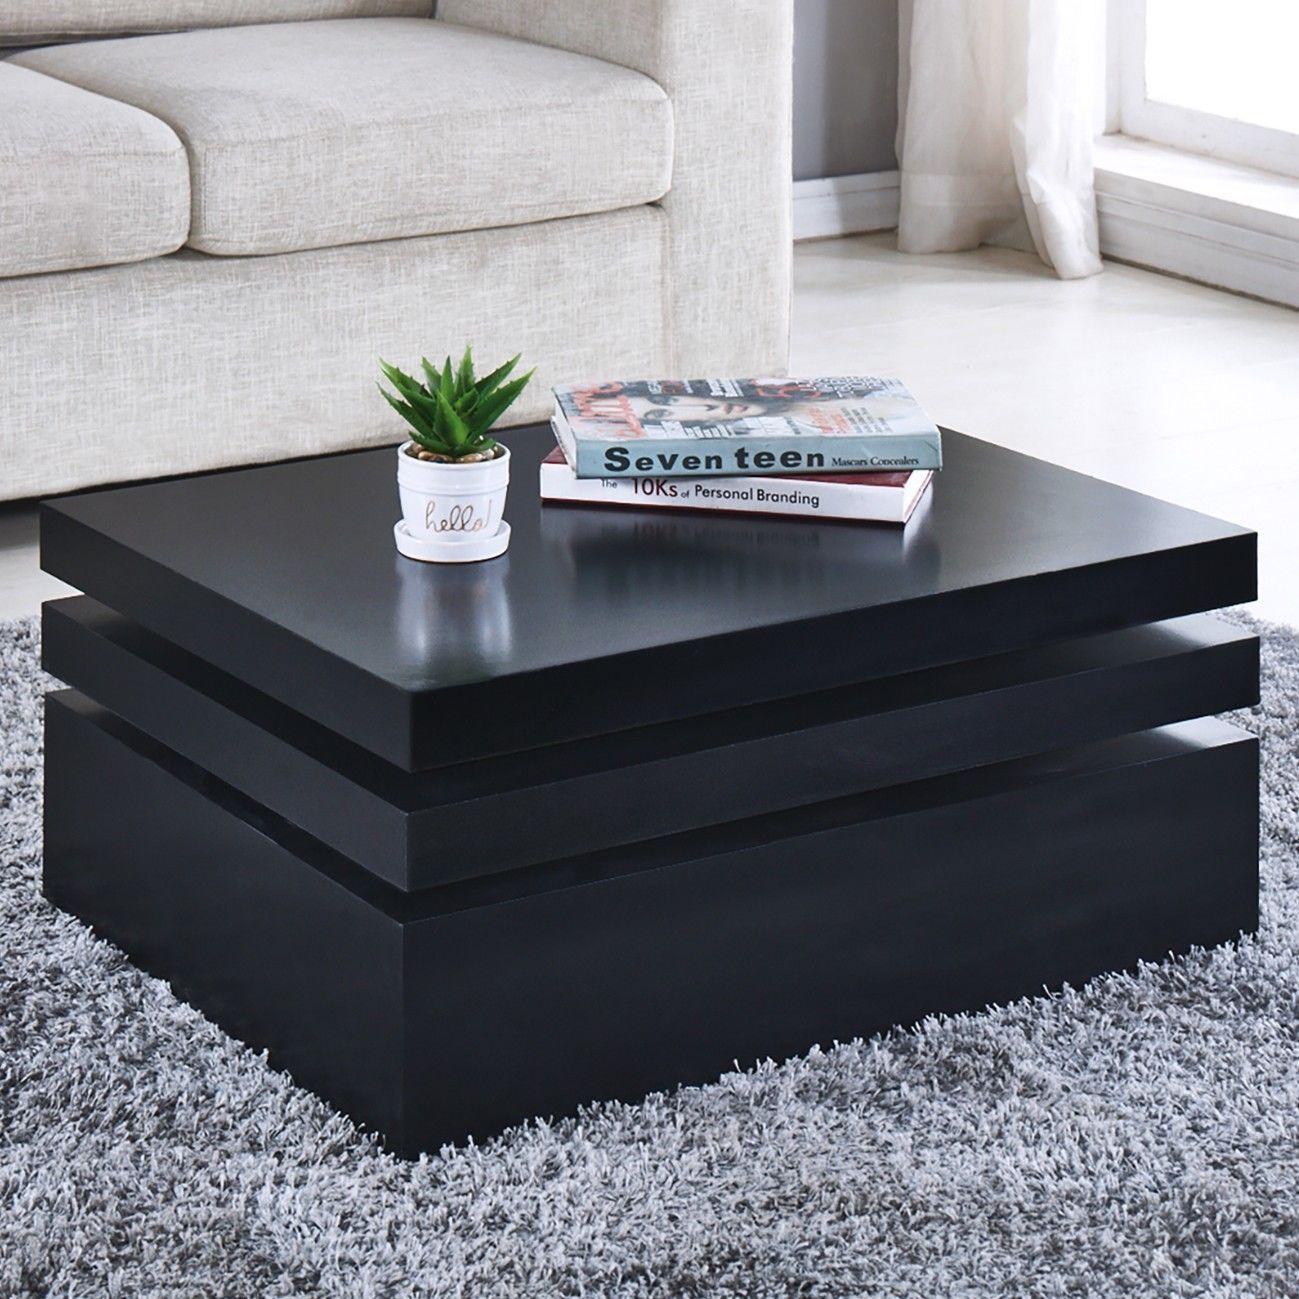 Black Square Coffee Table Rotating Contemporary Modern Livi Contemporary Modern Living Room Furniture Modern Contemporary Living Room Black Square Coffee Table